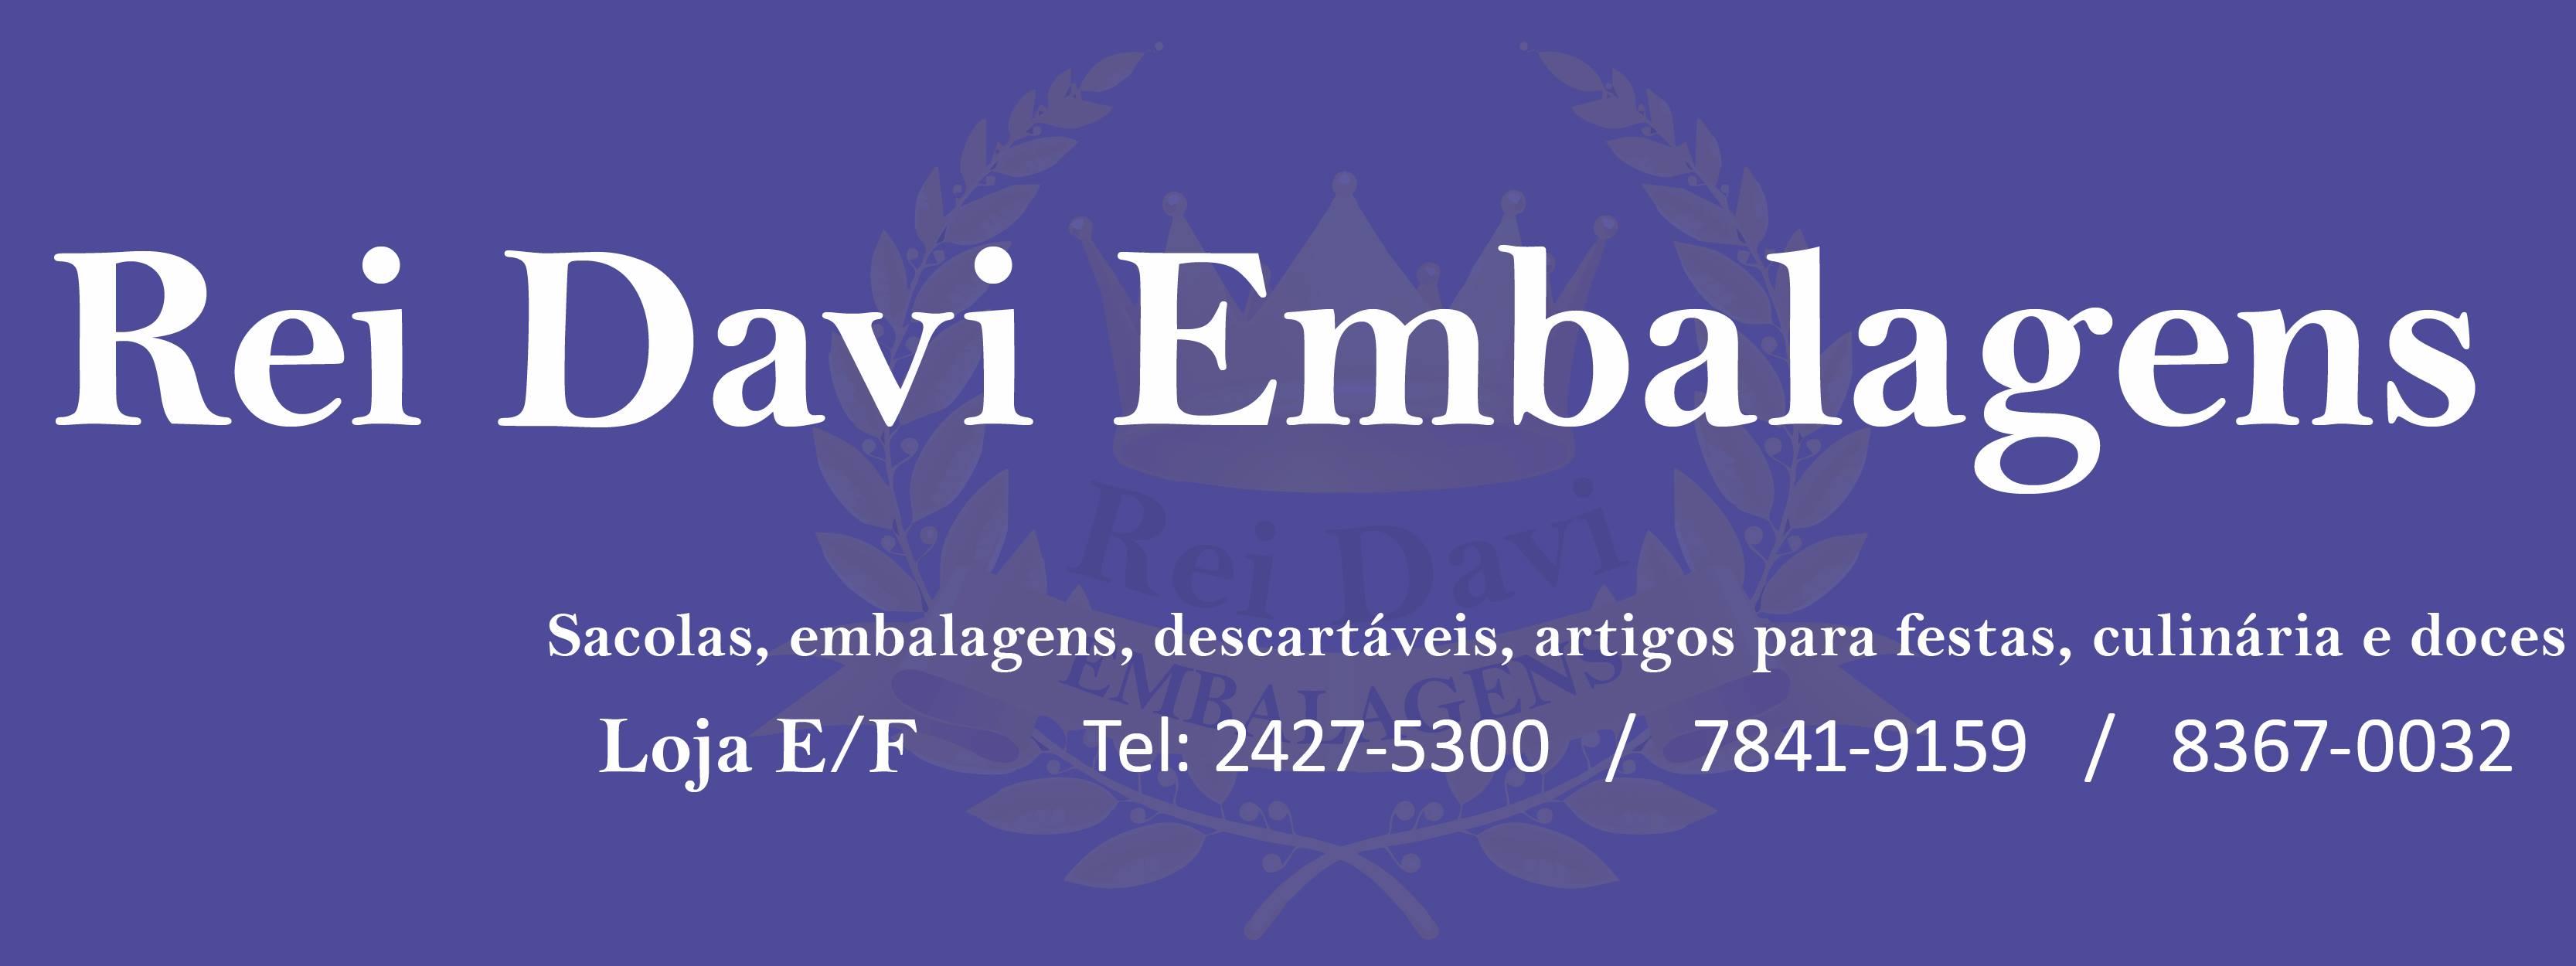 EMBALAGENS DESCARTAVEIS EM JACAREPAGUA RJ - REI DAVI EMBALAGENS - RJ